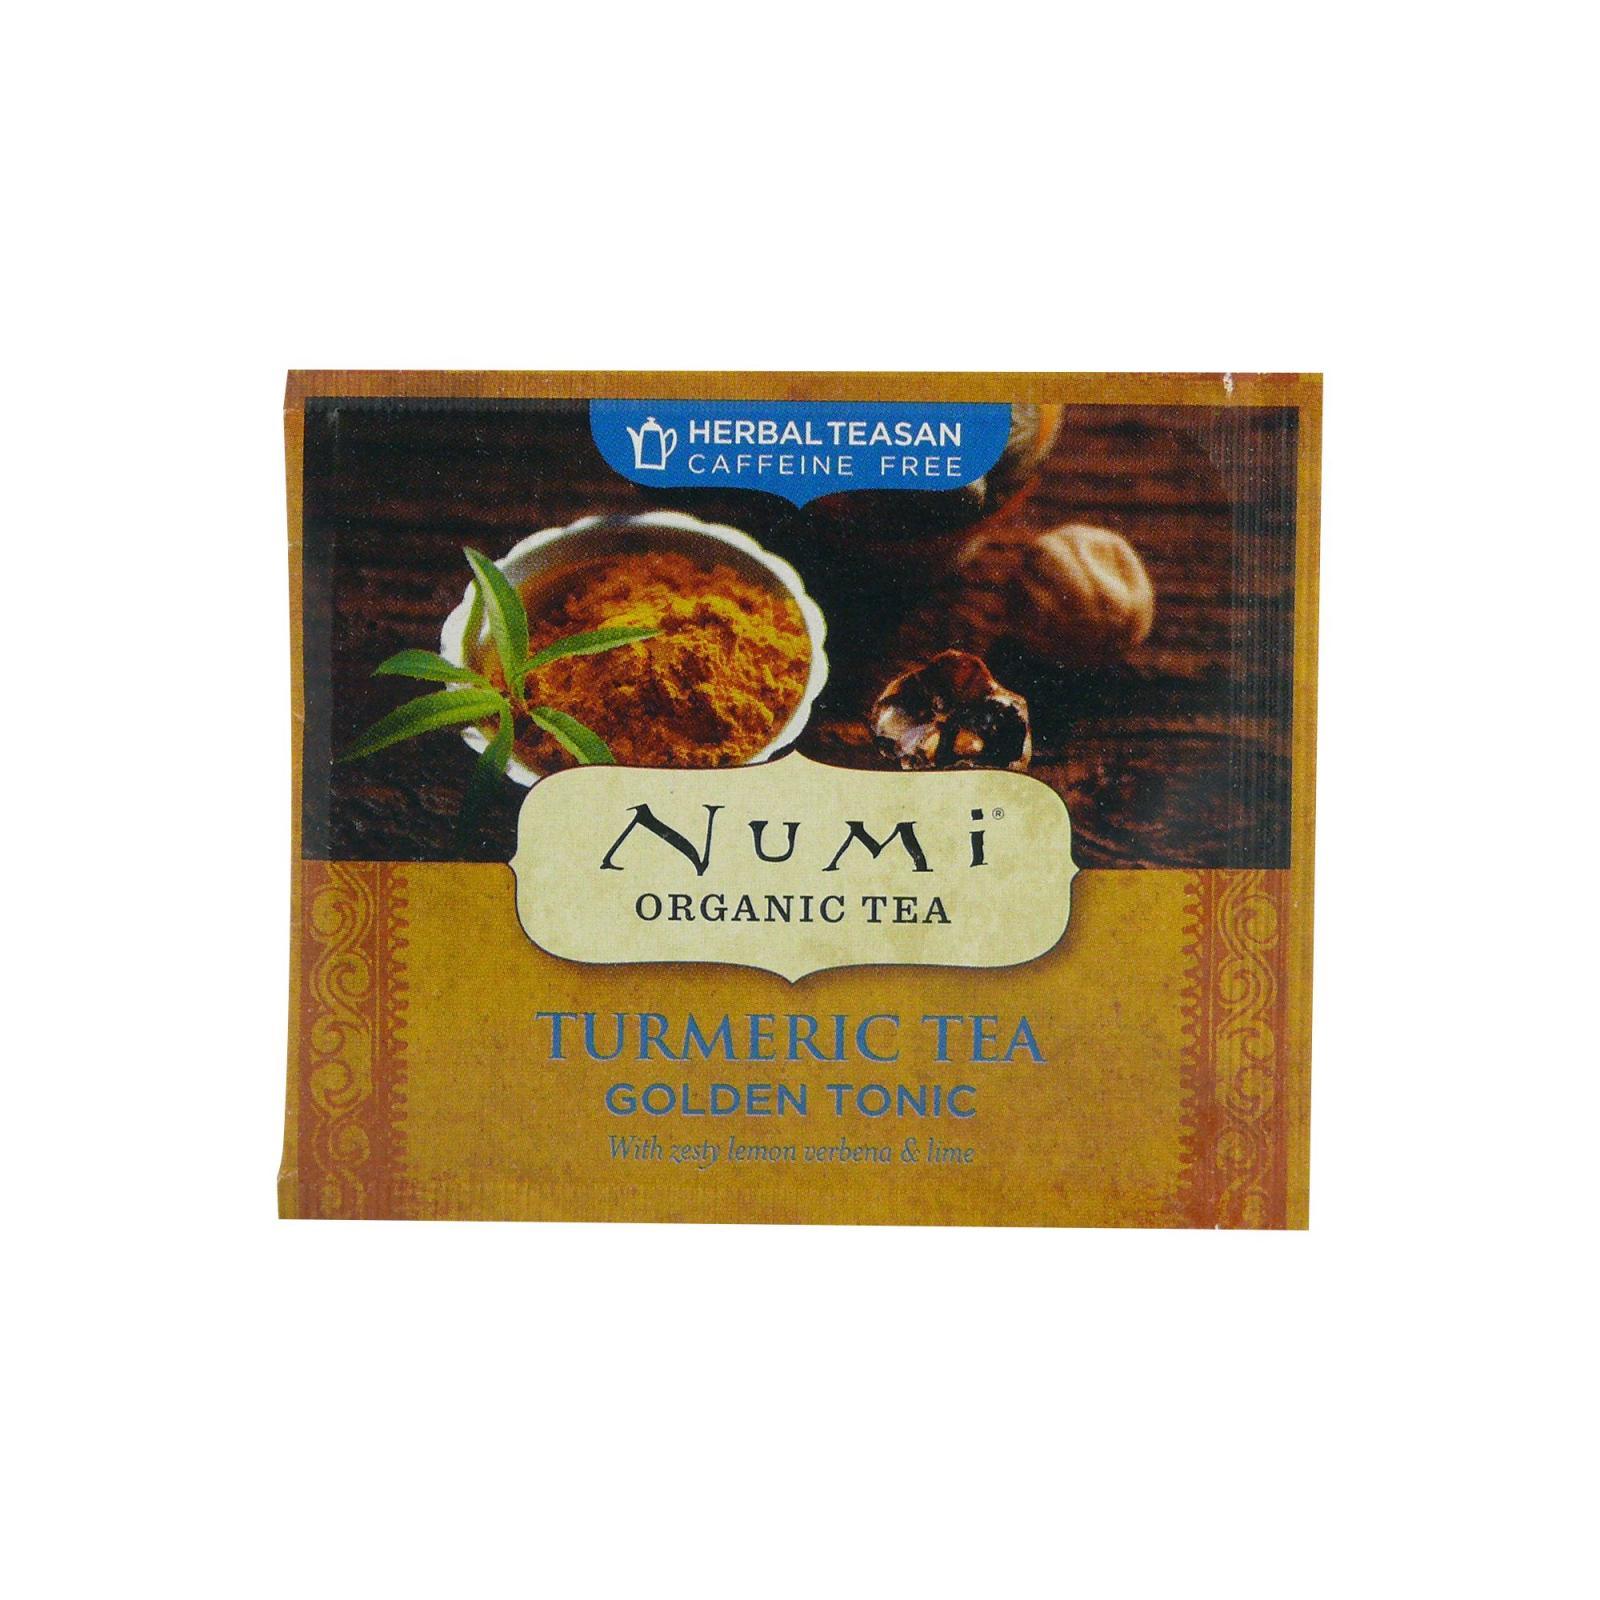 Numi Organic Tea Kořeněný čaj Golden Tonic, Turmeric Tea 3,1 g, 1 ks